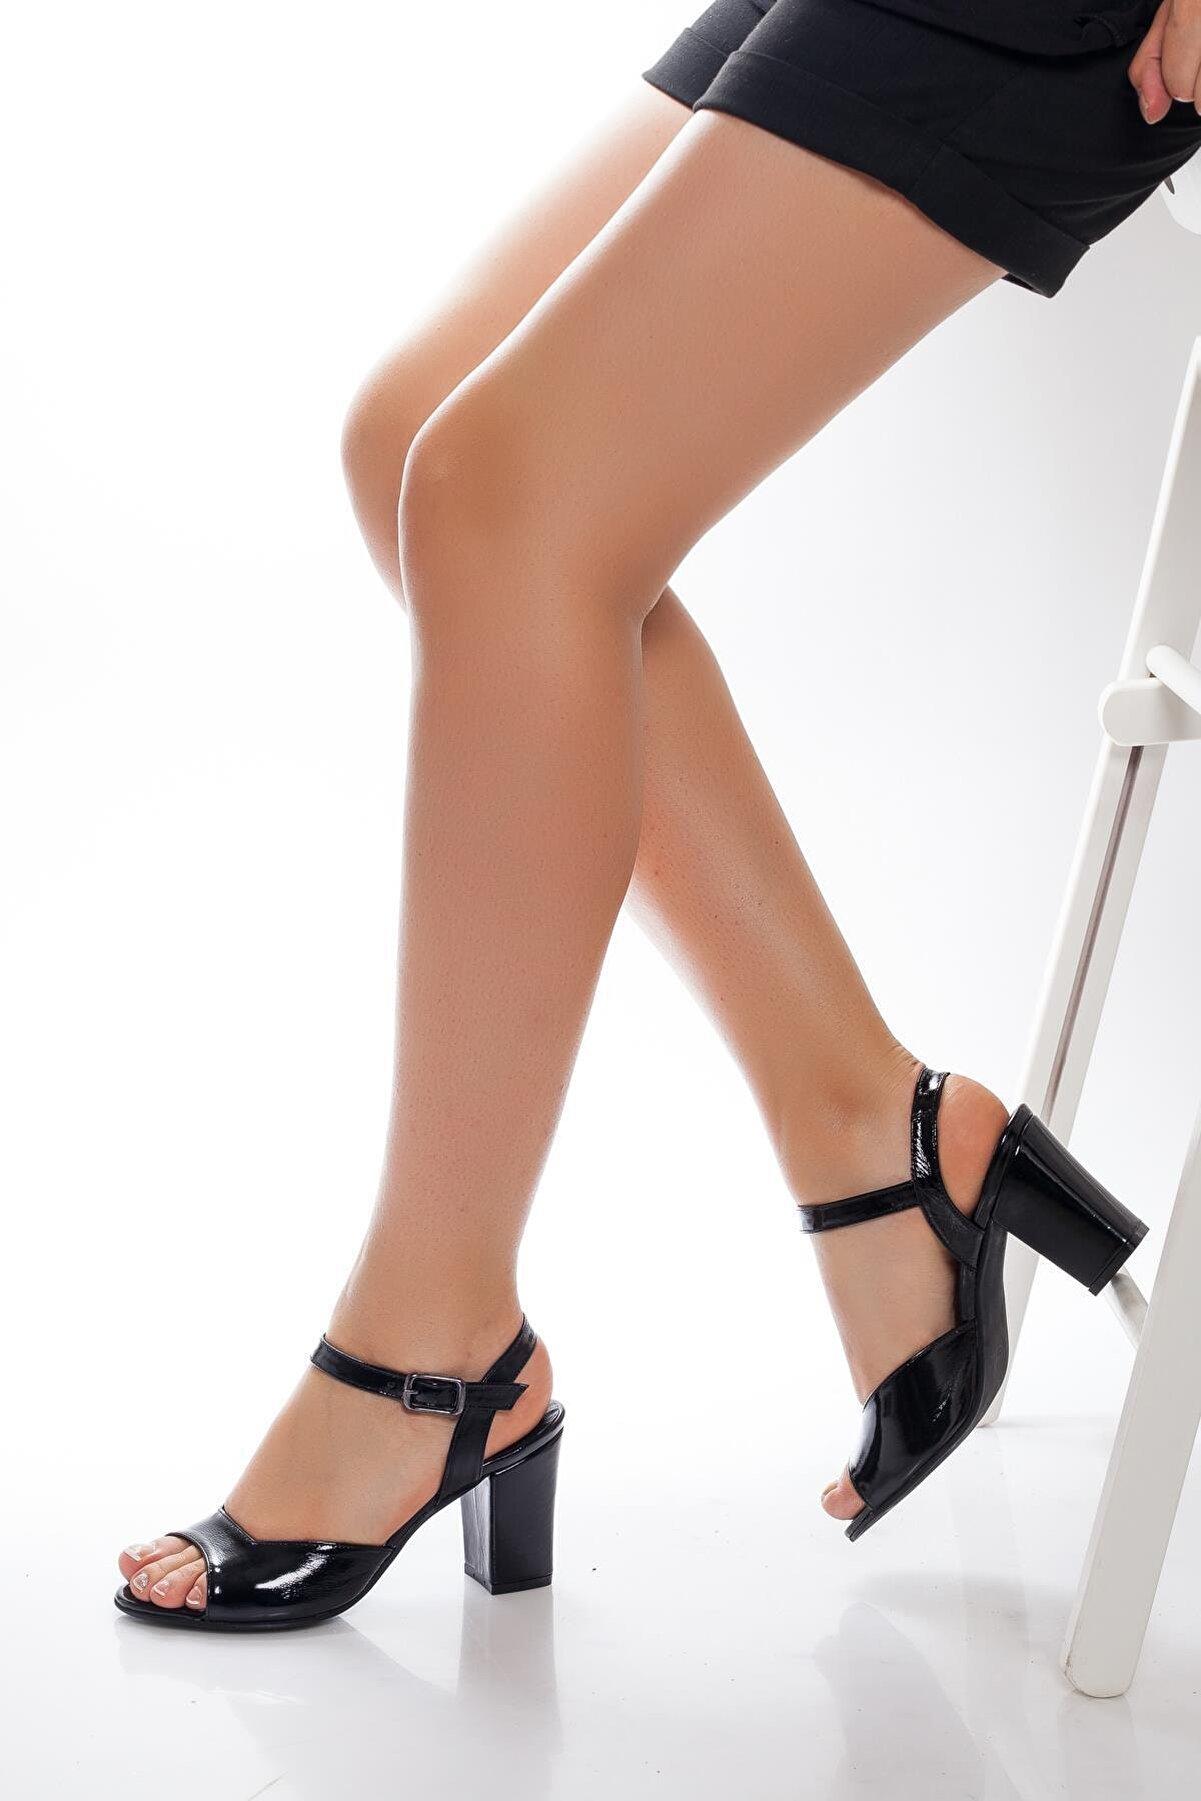 Deripabuc Hakiki Deri Siyah Rugan Kadın Topuklu Deri Ayakkabı Shn-0037